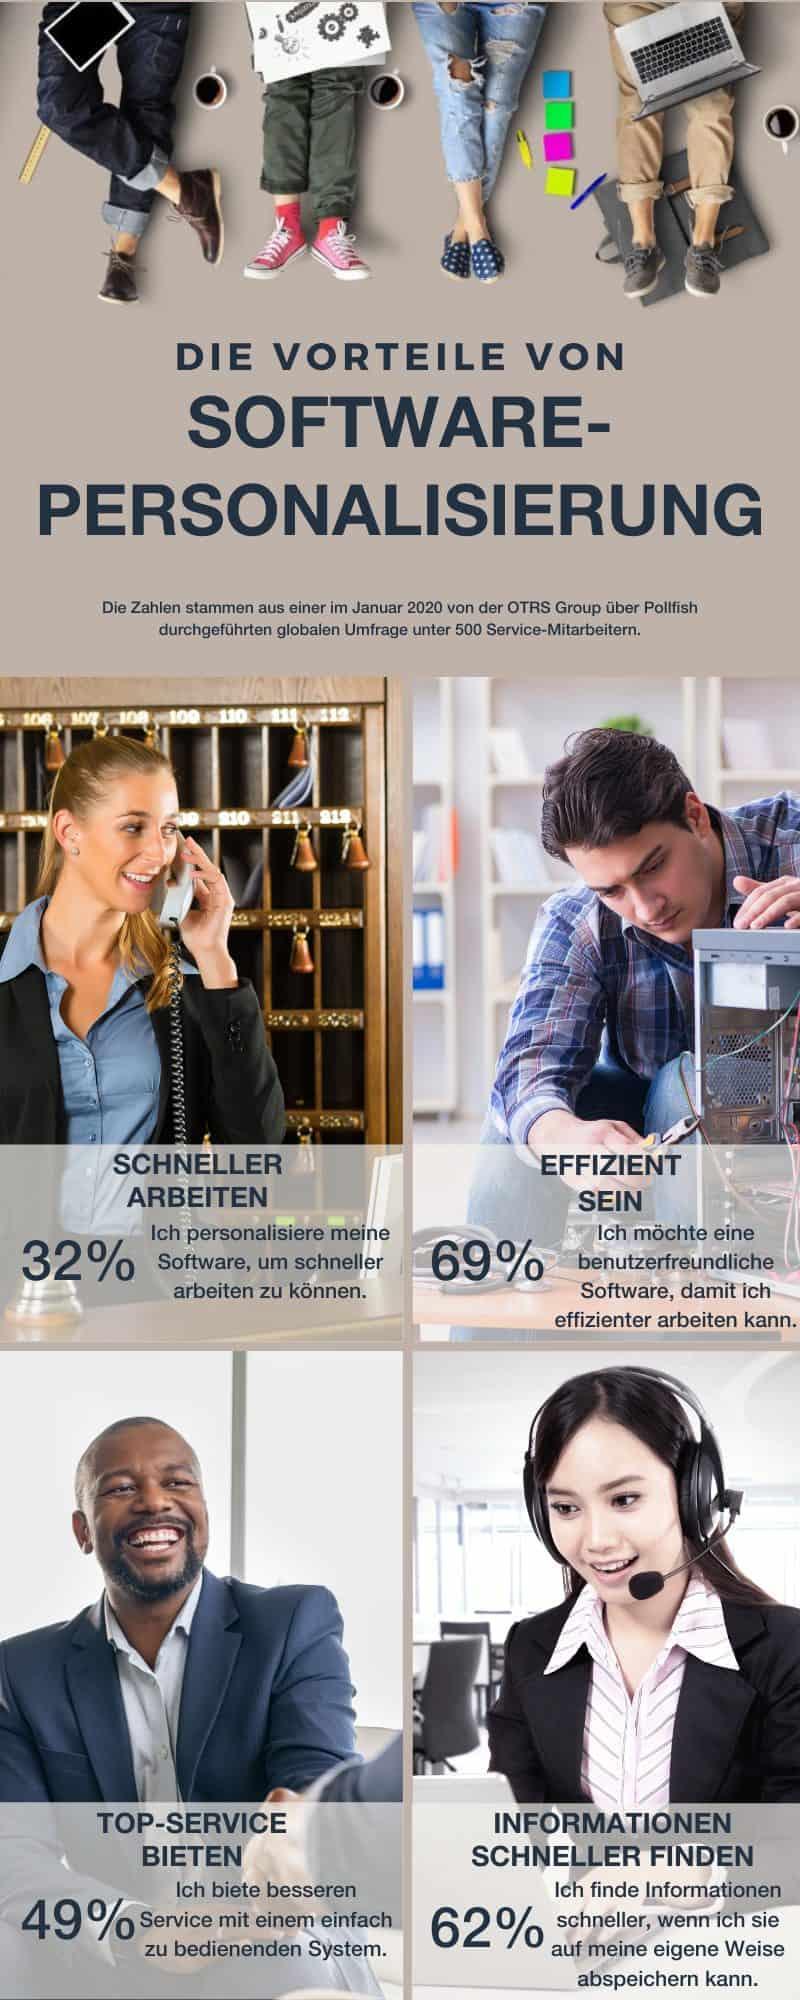 Personalization-Infographic_DE